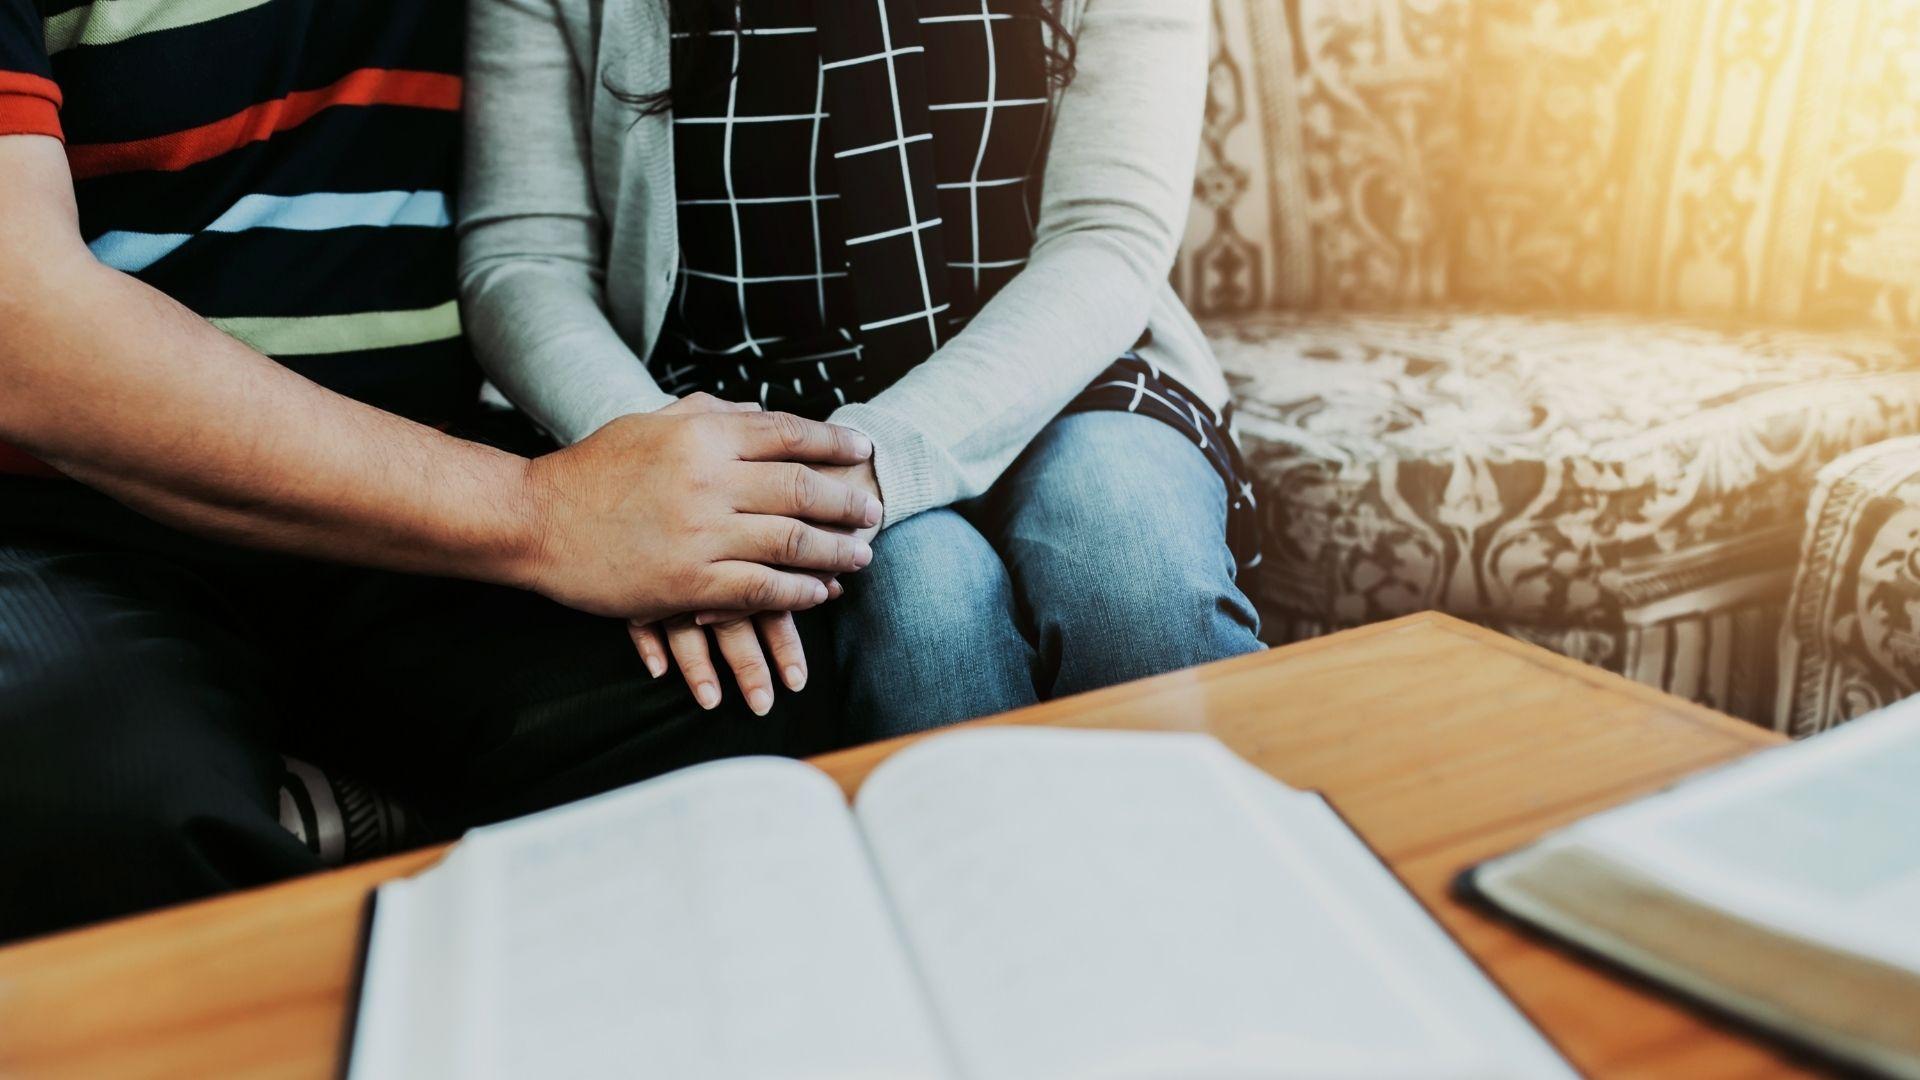 should christian couples do devotion together